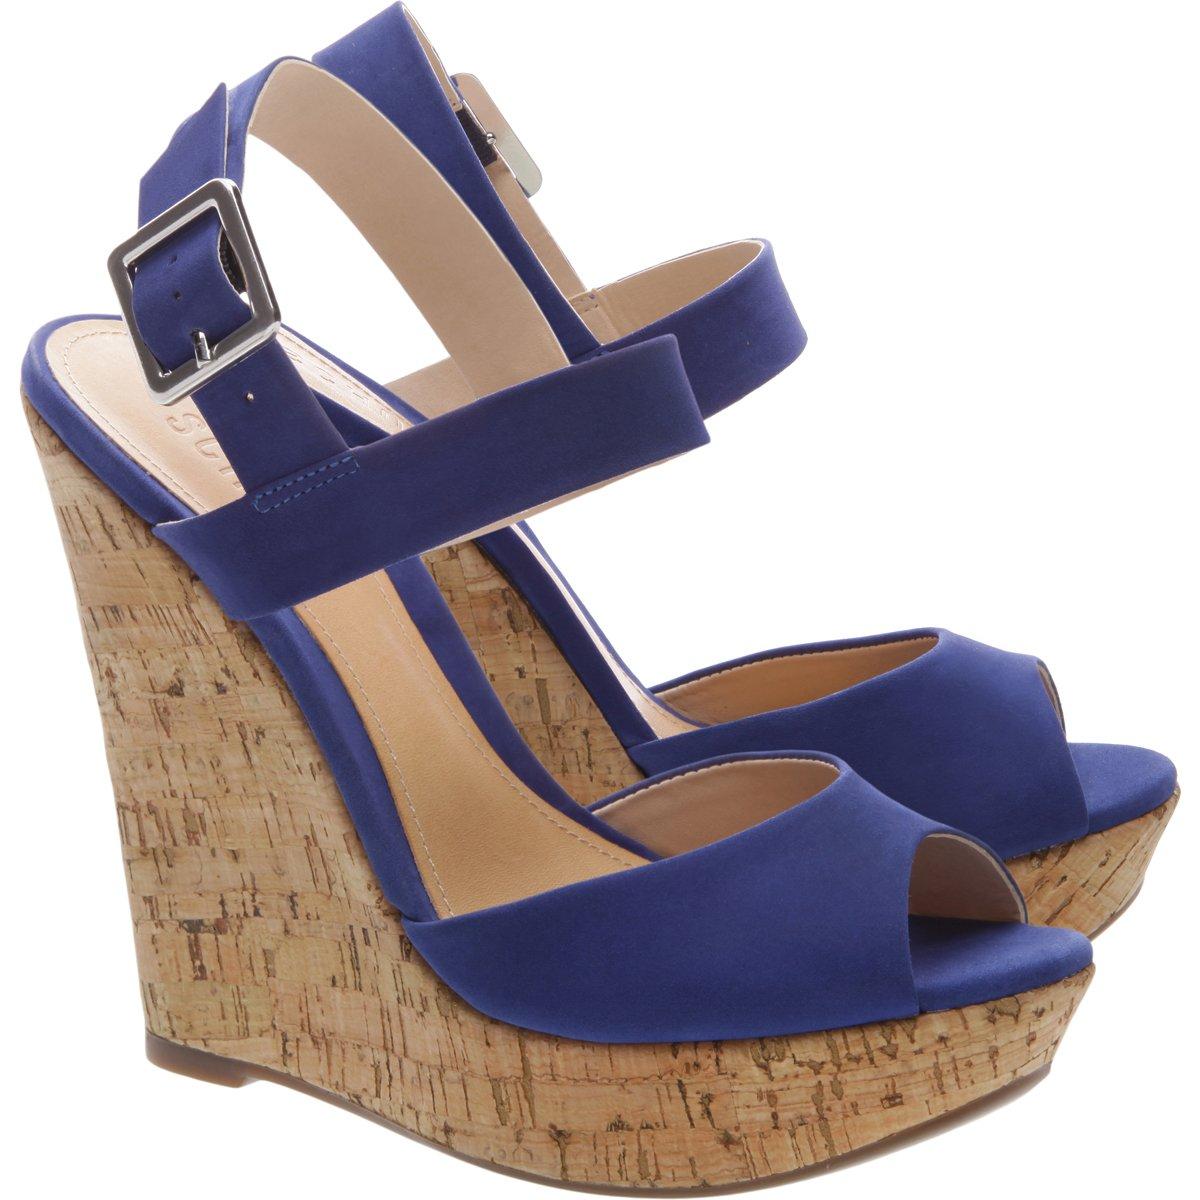 Schutz Raffe Jeans Blue High Heel Peep Toe Platform Sandal 11, Jeans